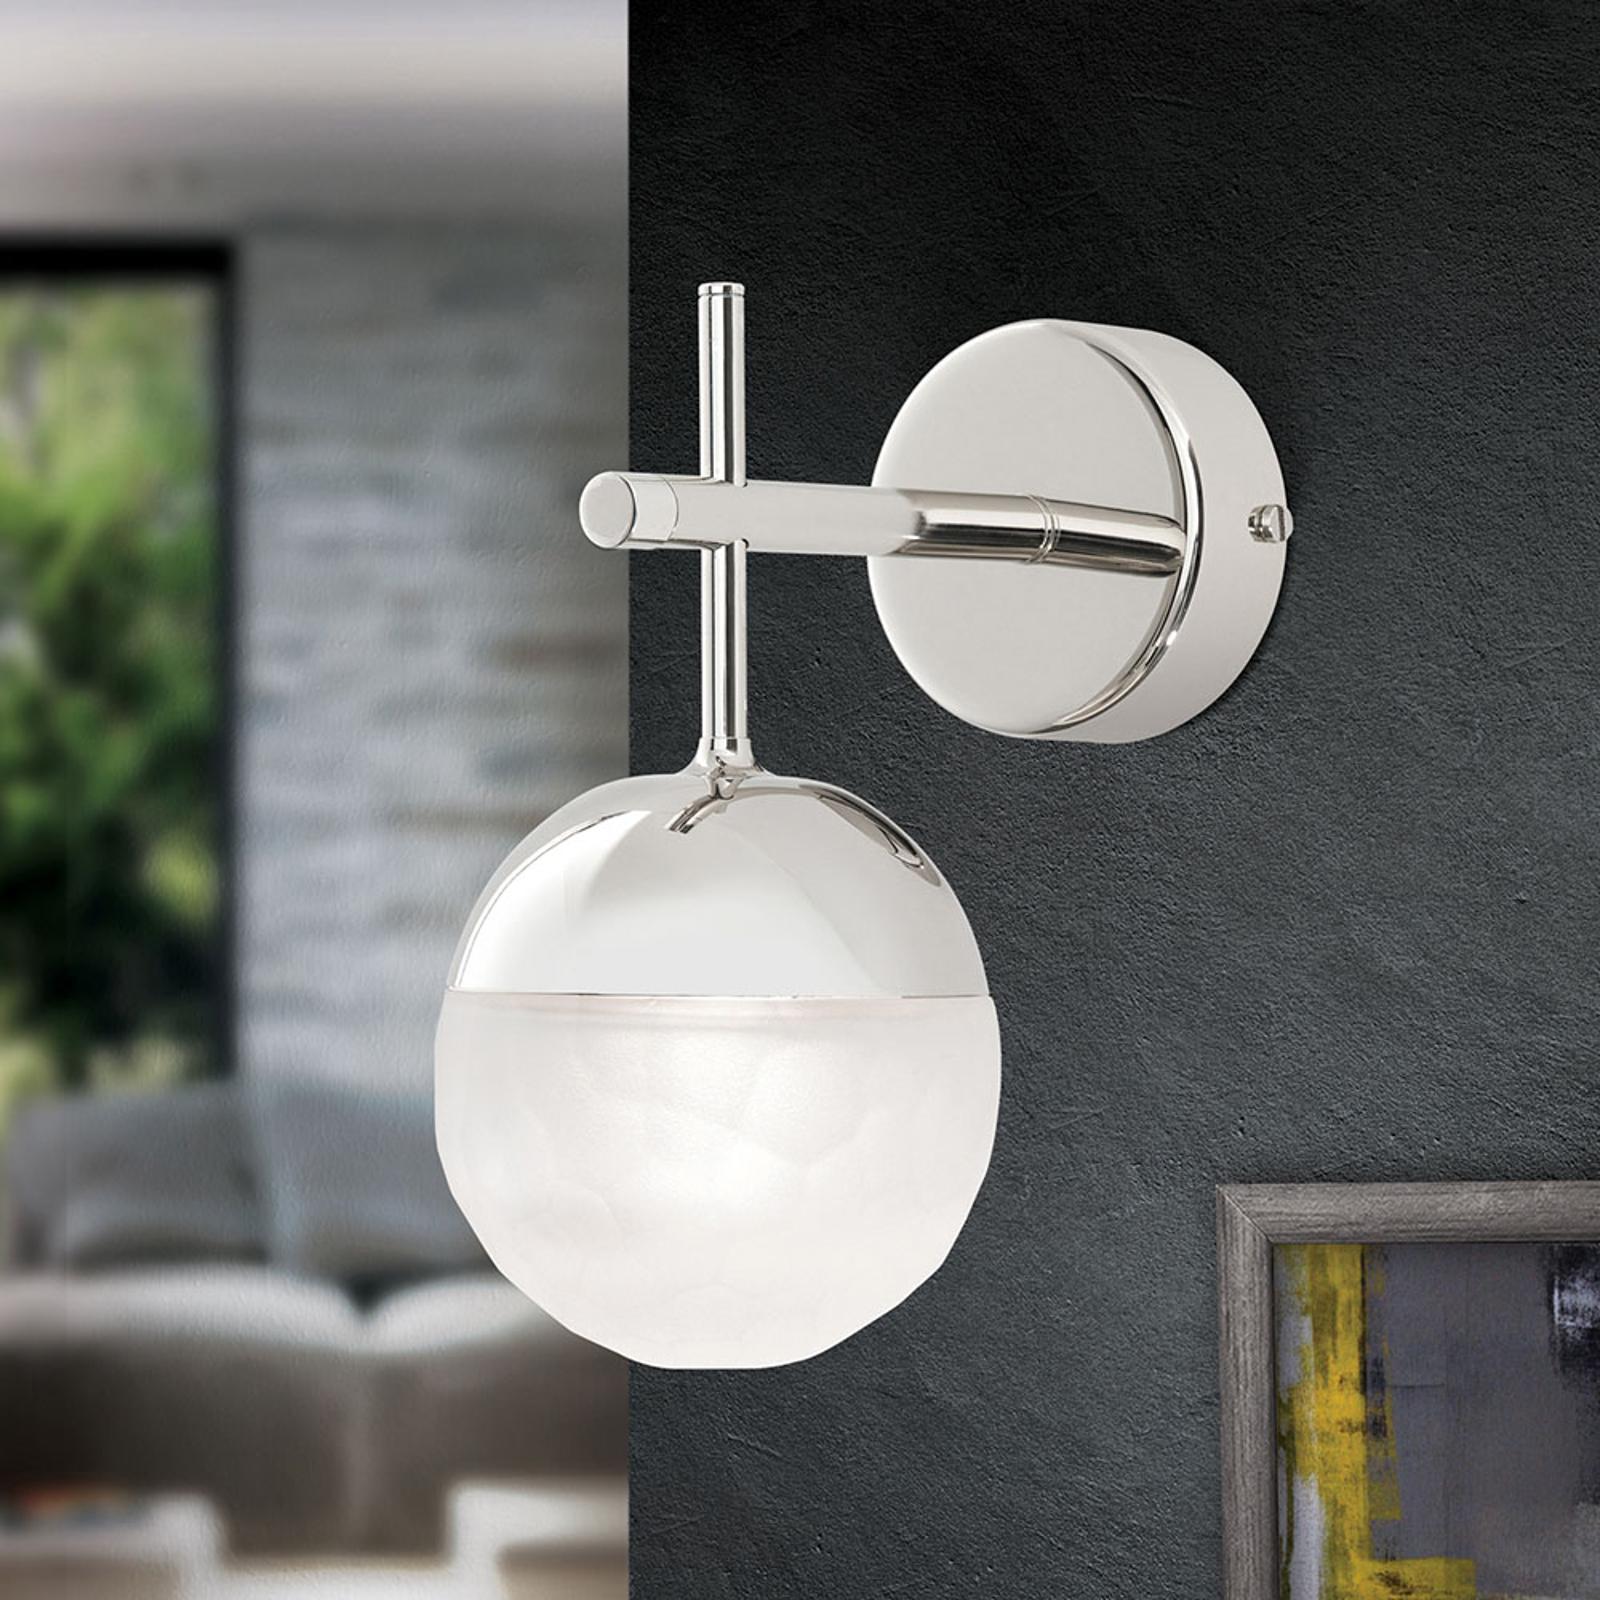 LED-Wandleuchte Ball, einflammig, nickel, abwärts